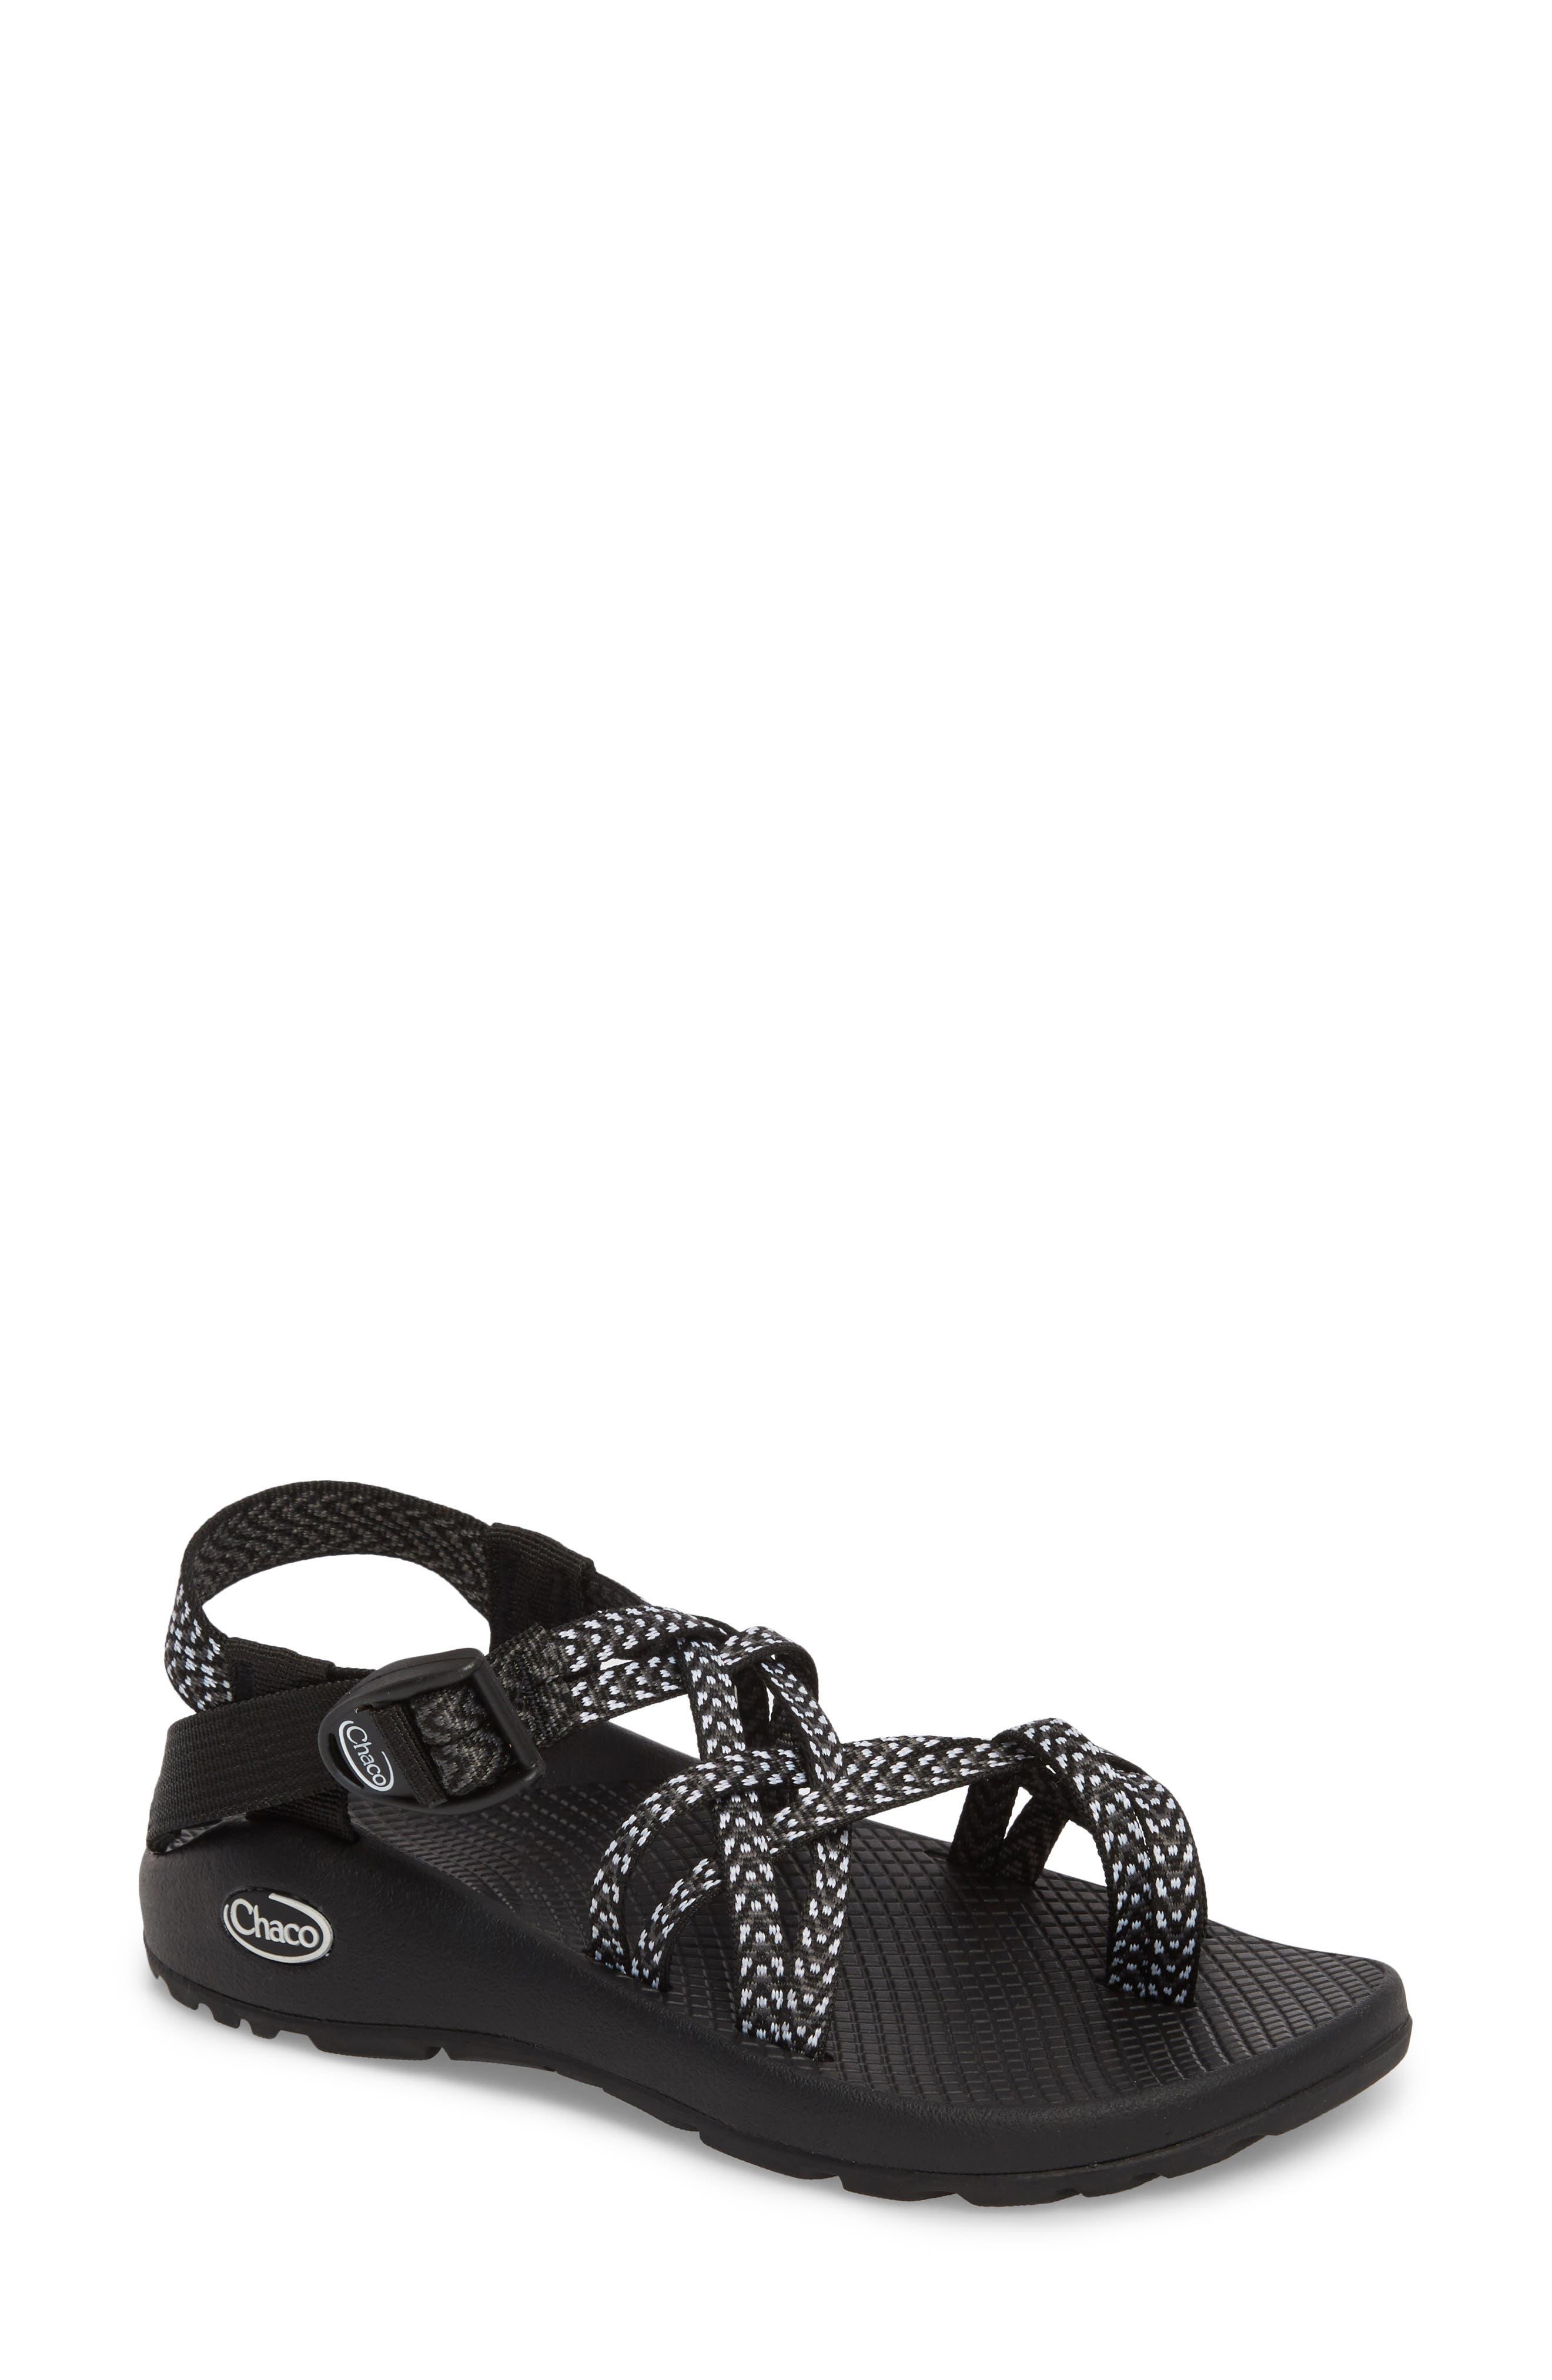 Chaco ZX/2® Classic Sandal (Women